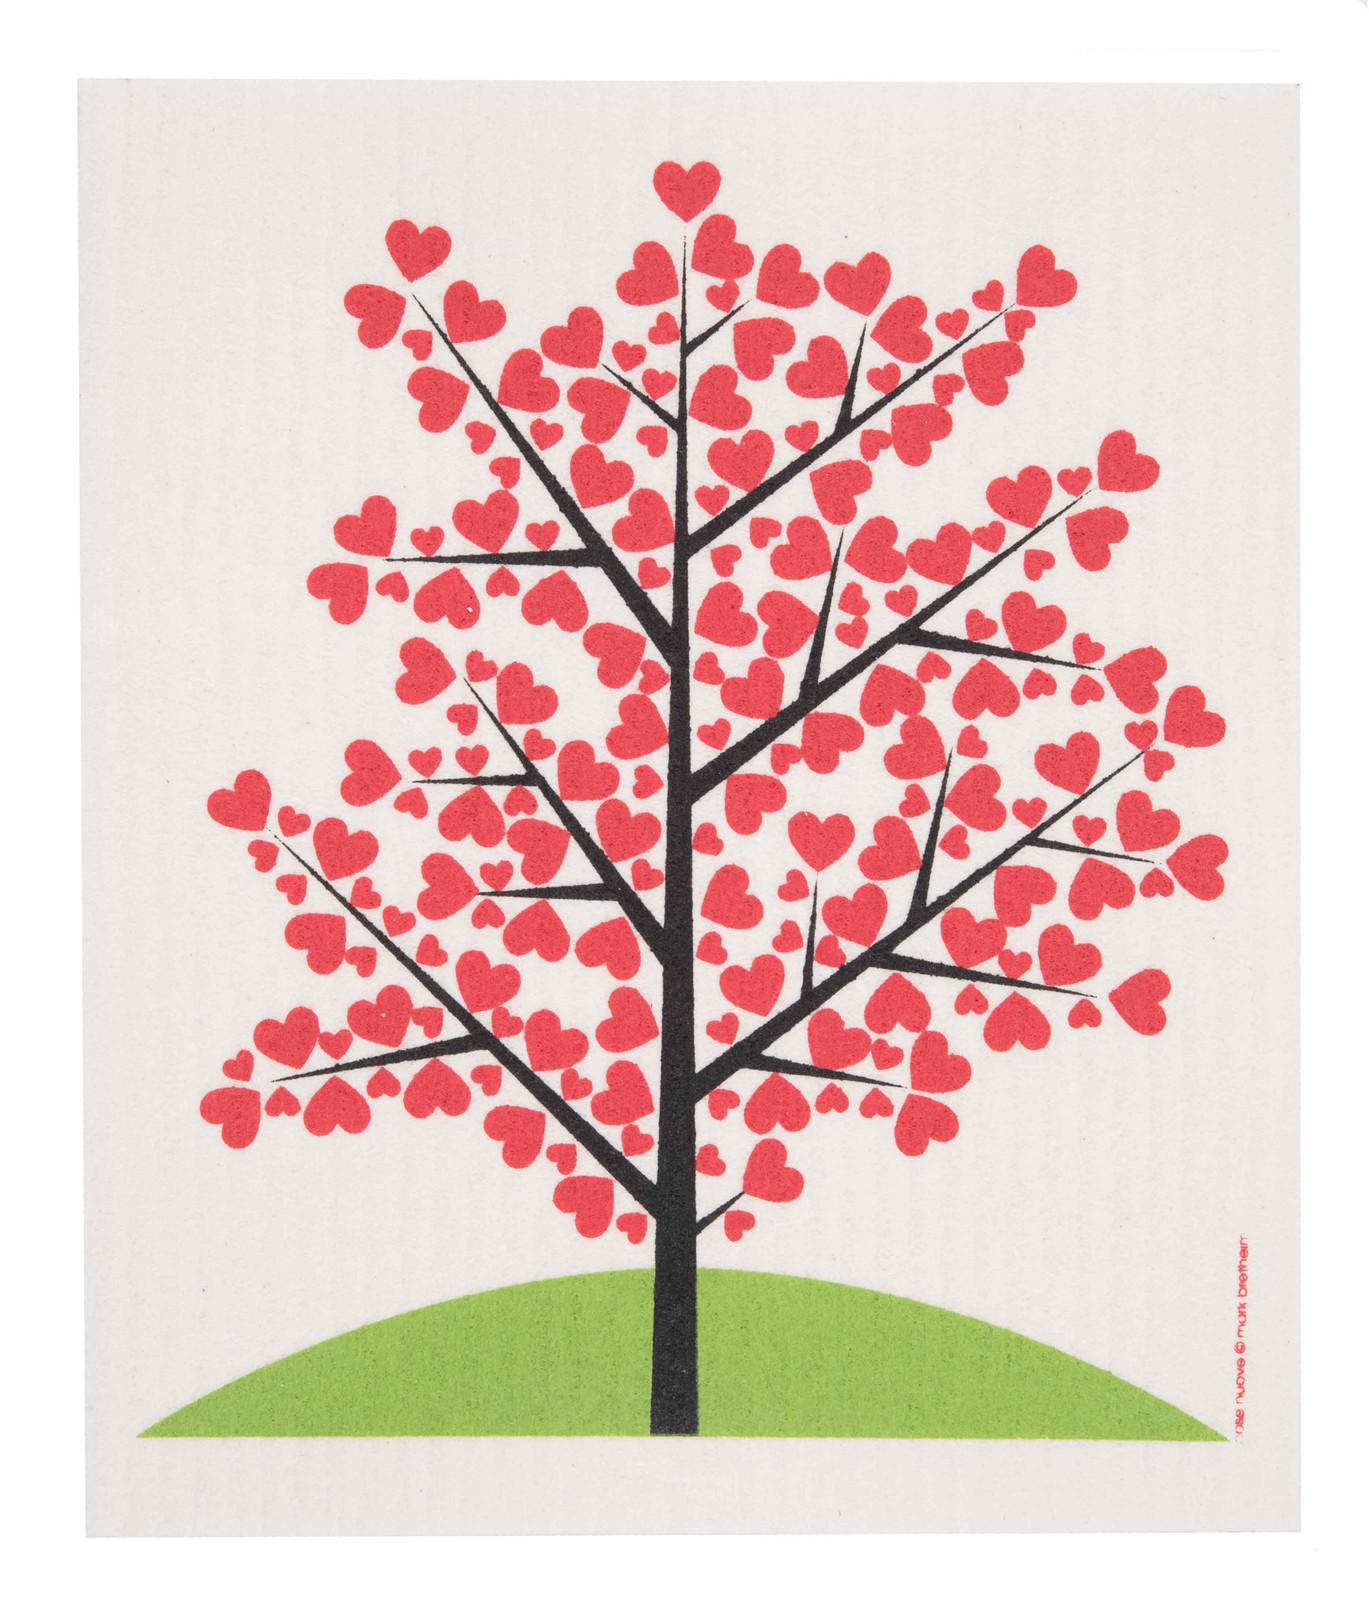 Swedish Dishcloth - Tree of Hearts (1055-0221-0400)